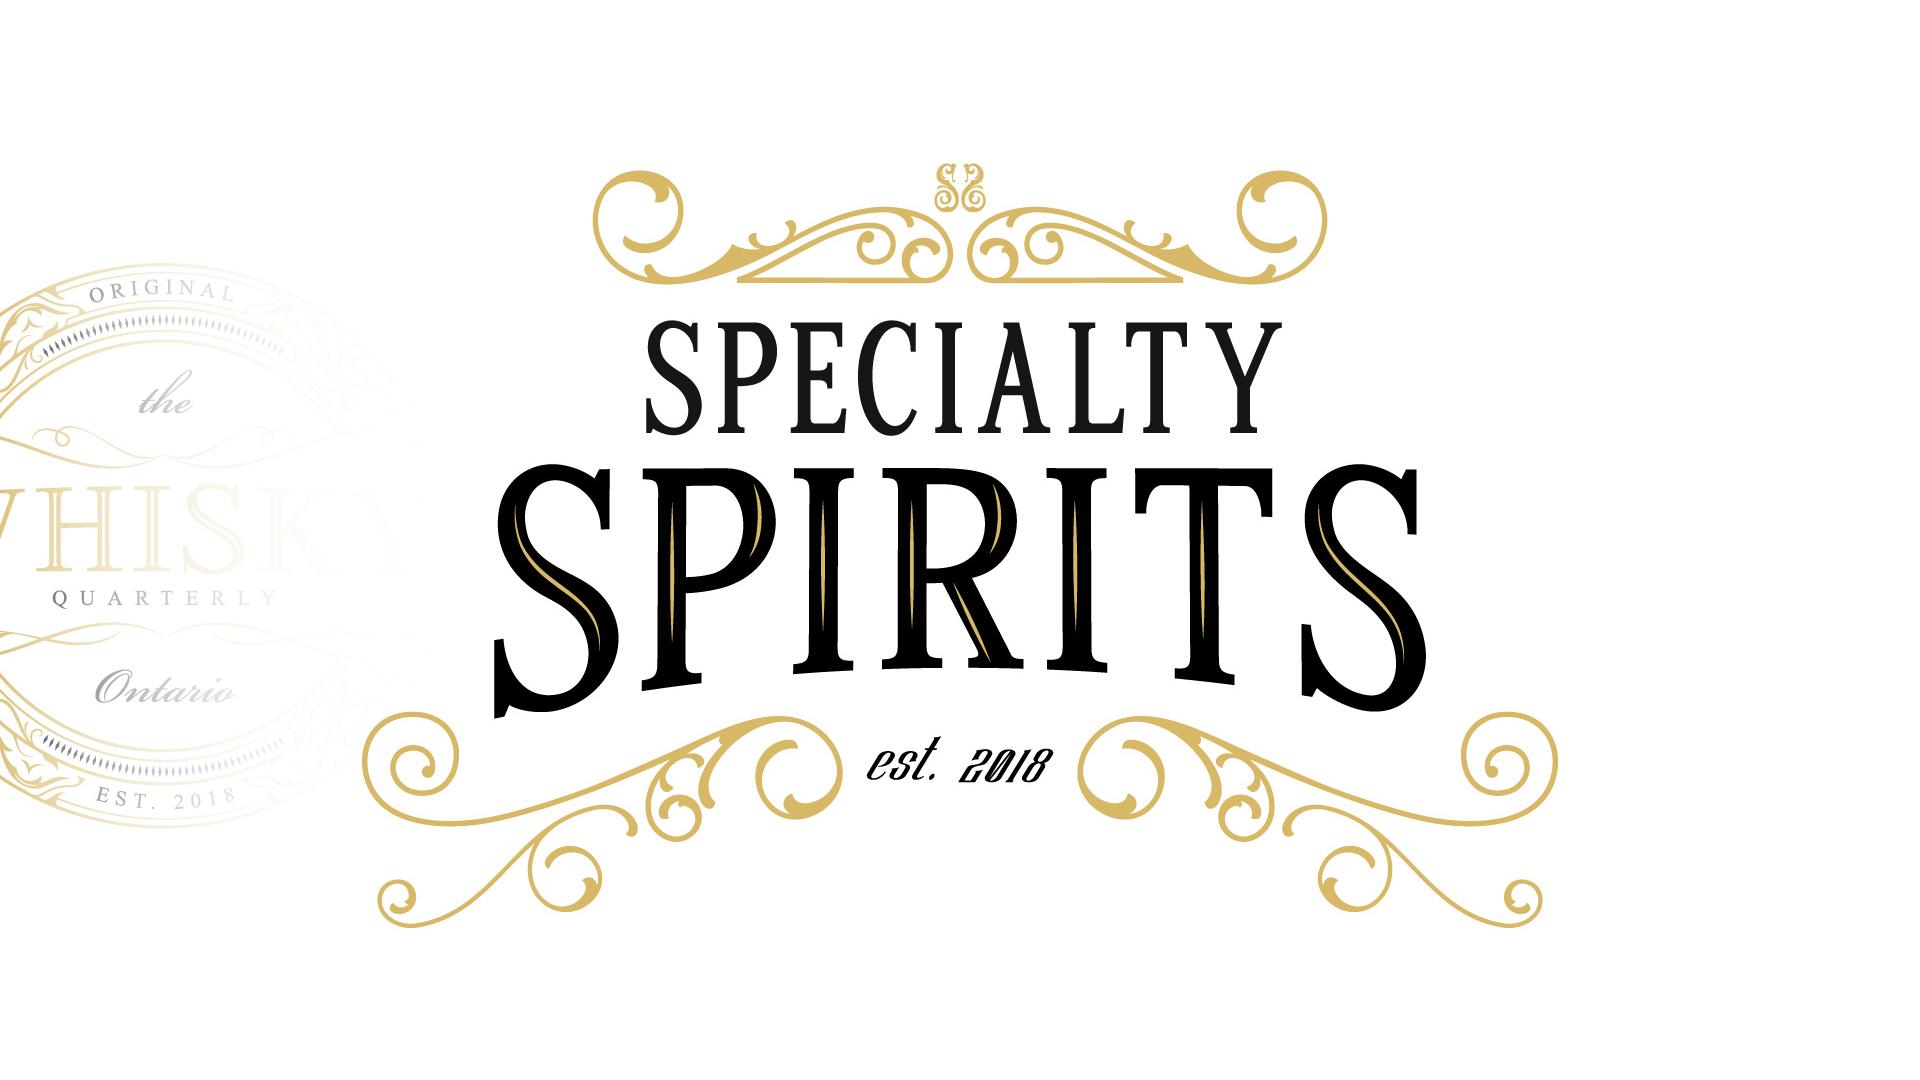 Specialty Spirits